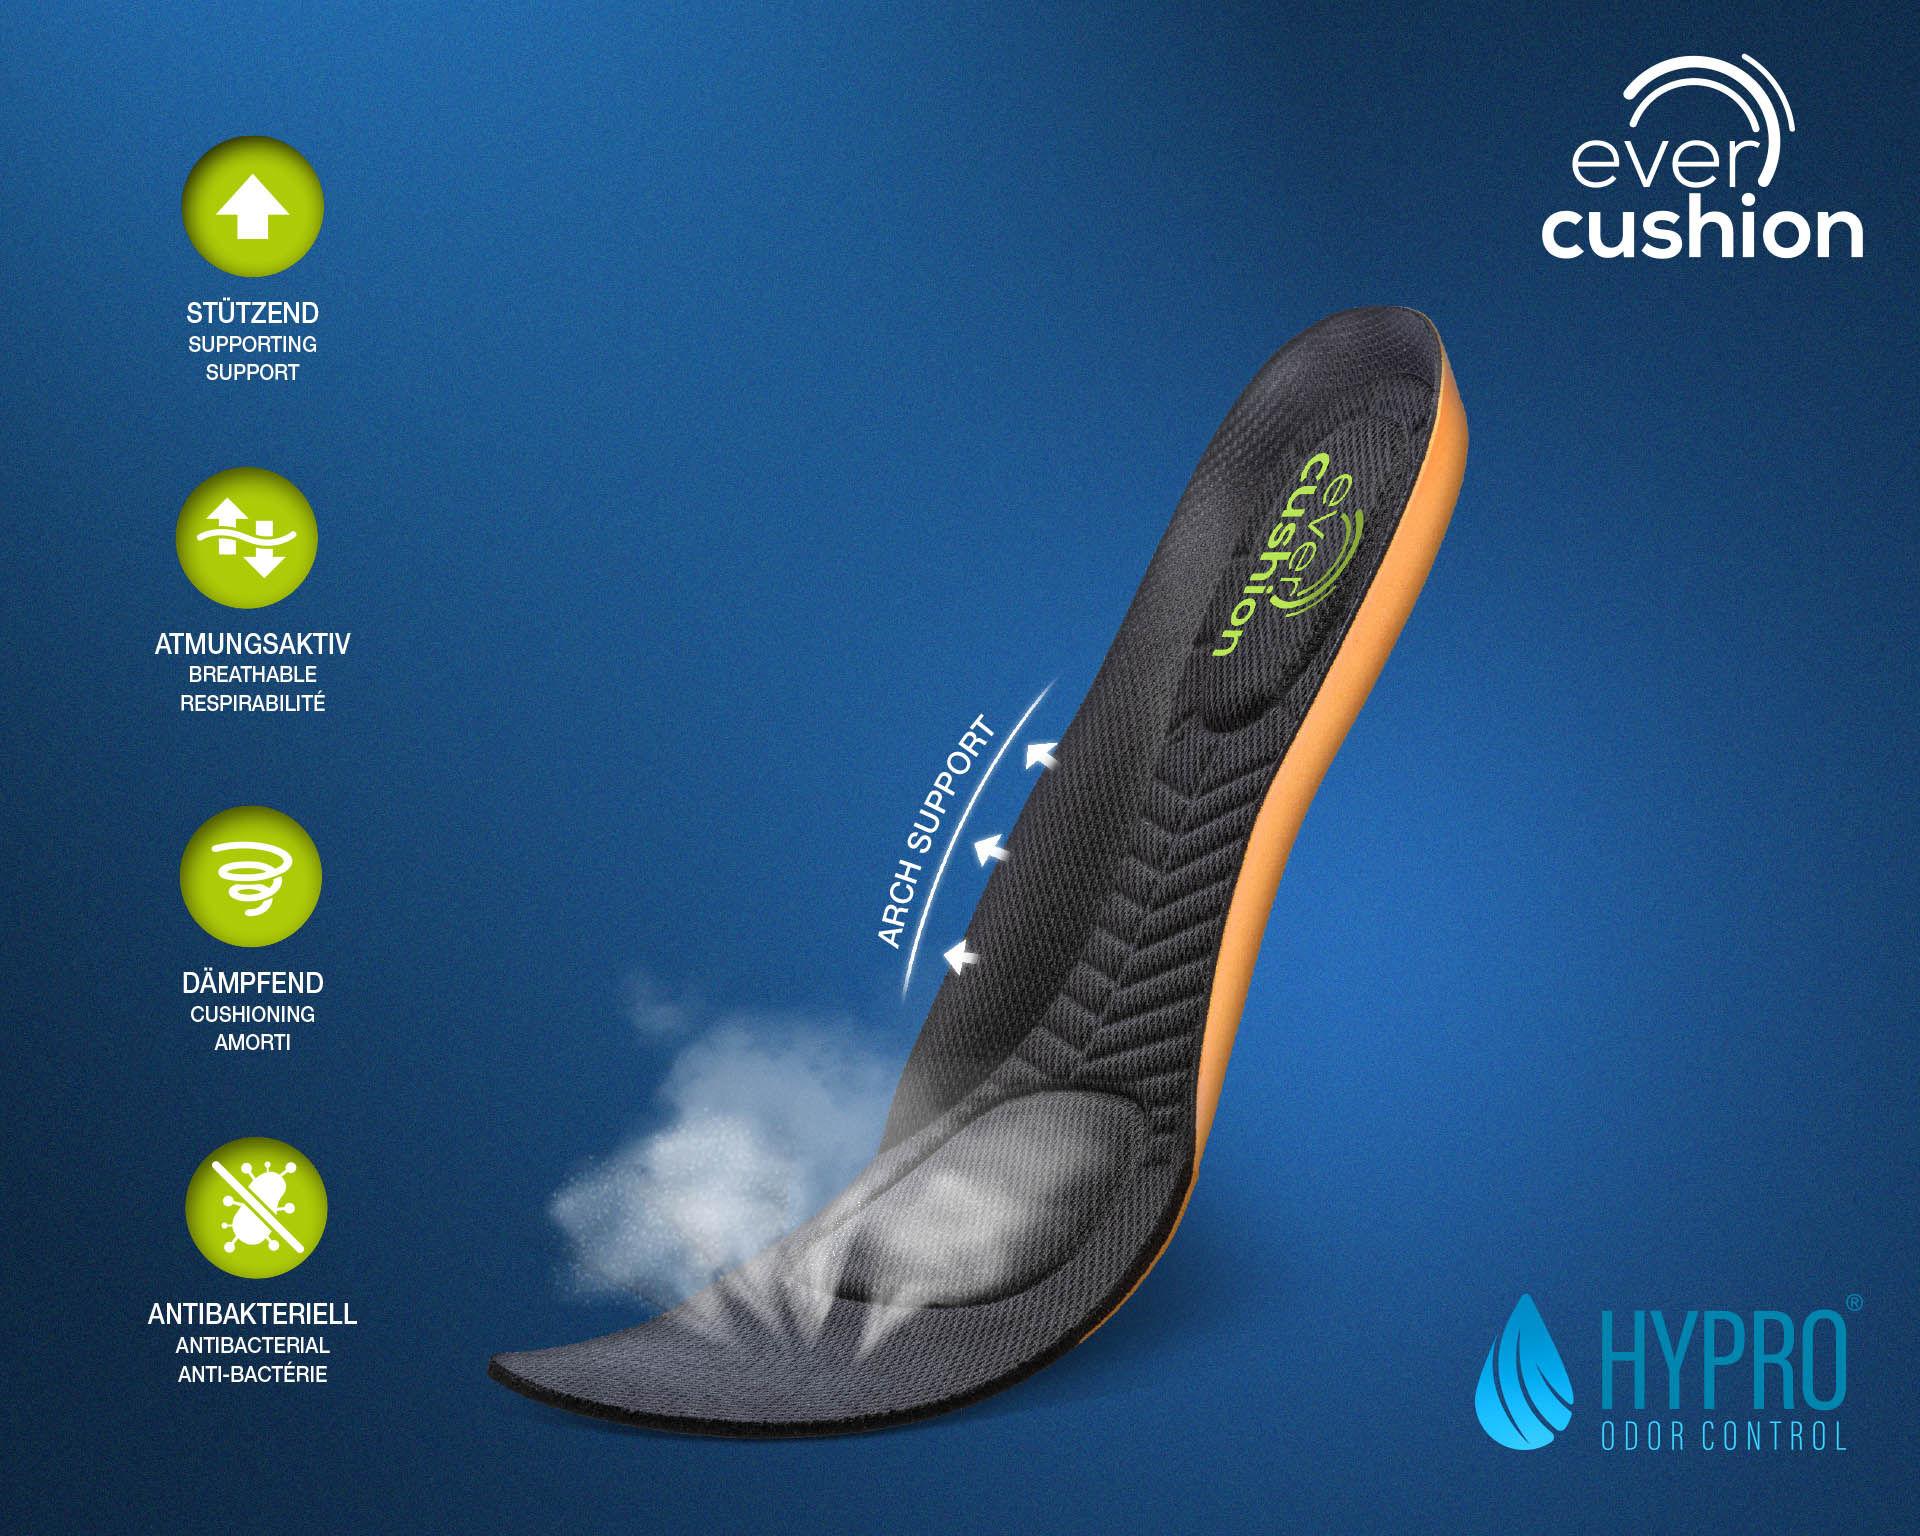 Evercushion custom fit einlegesohle grün